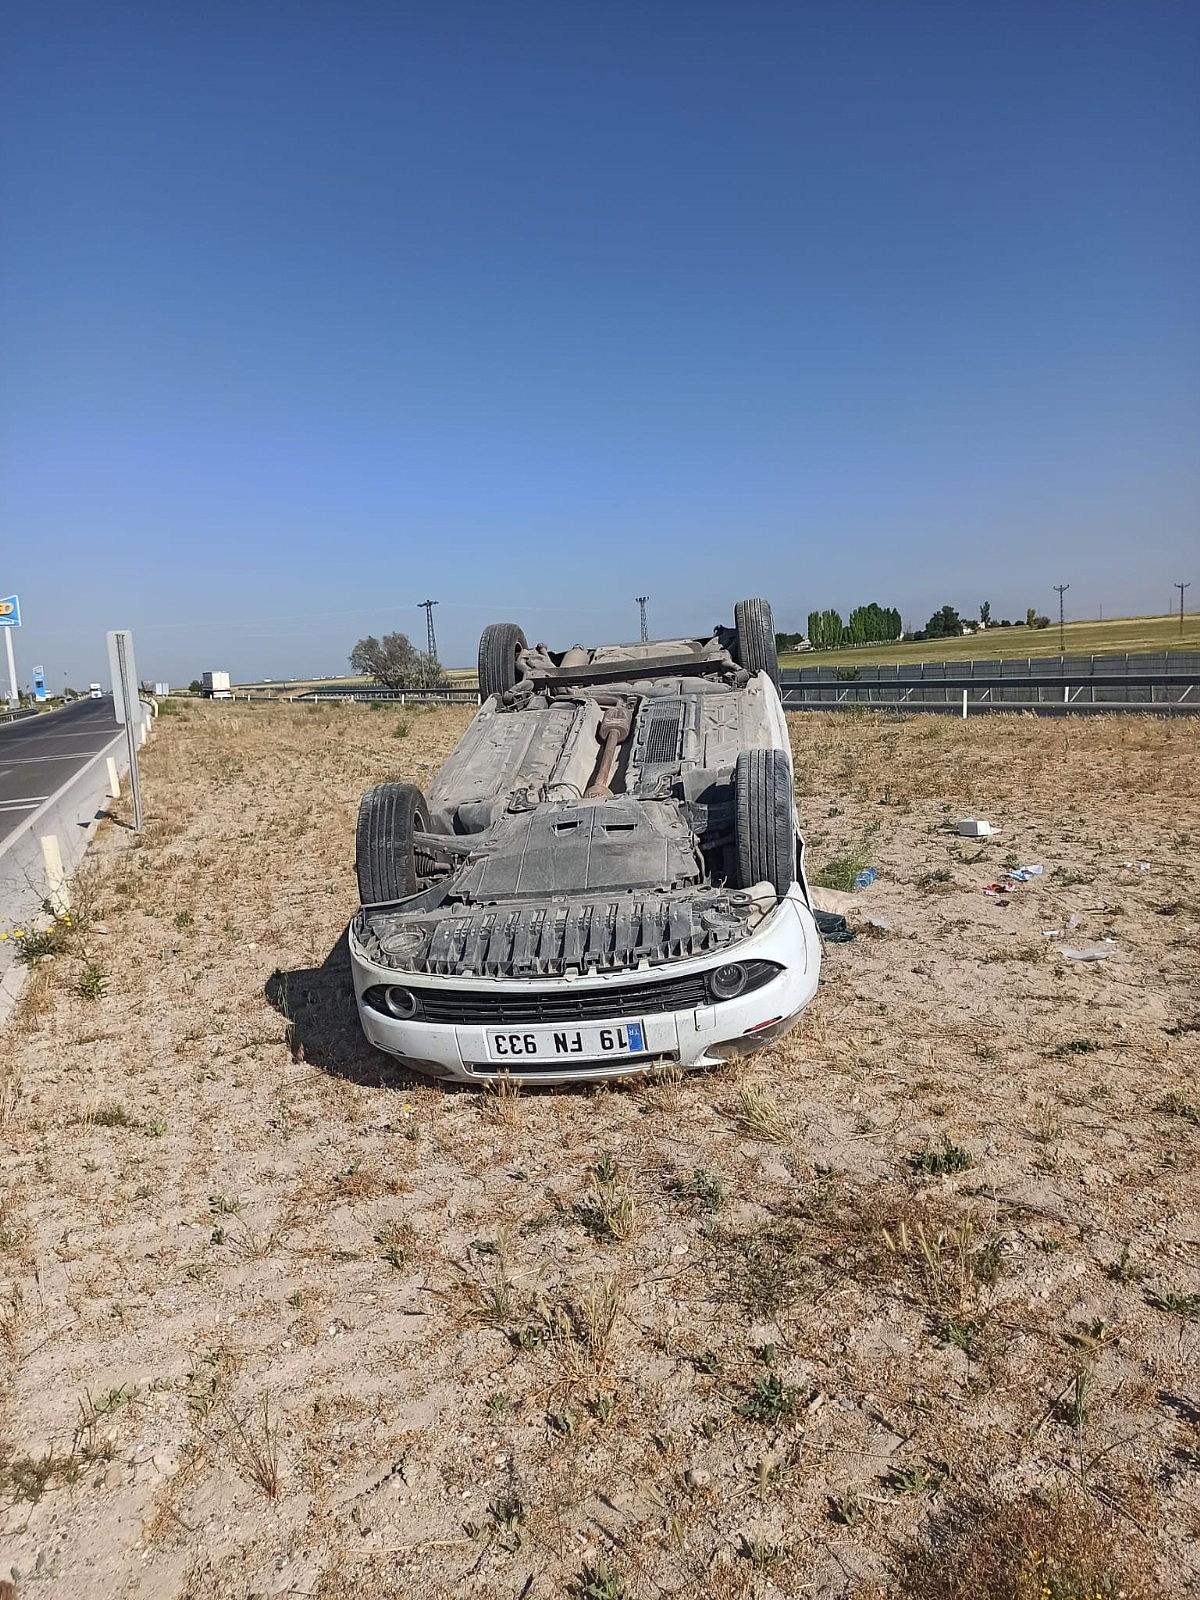 2021/05/otomobil-refuje-takla-atti-3-yarali-20210530AW33-4.jpg